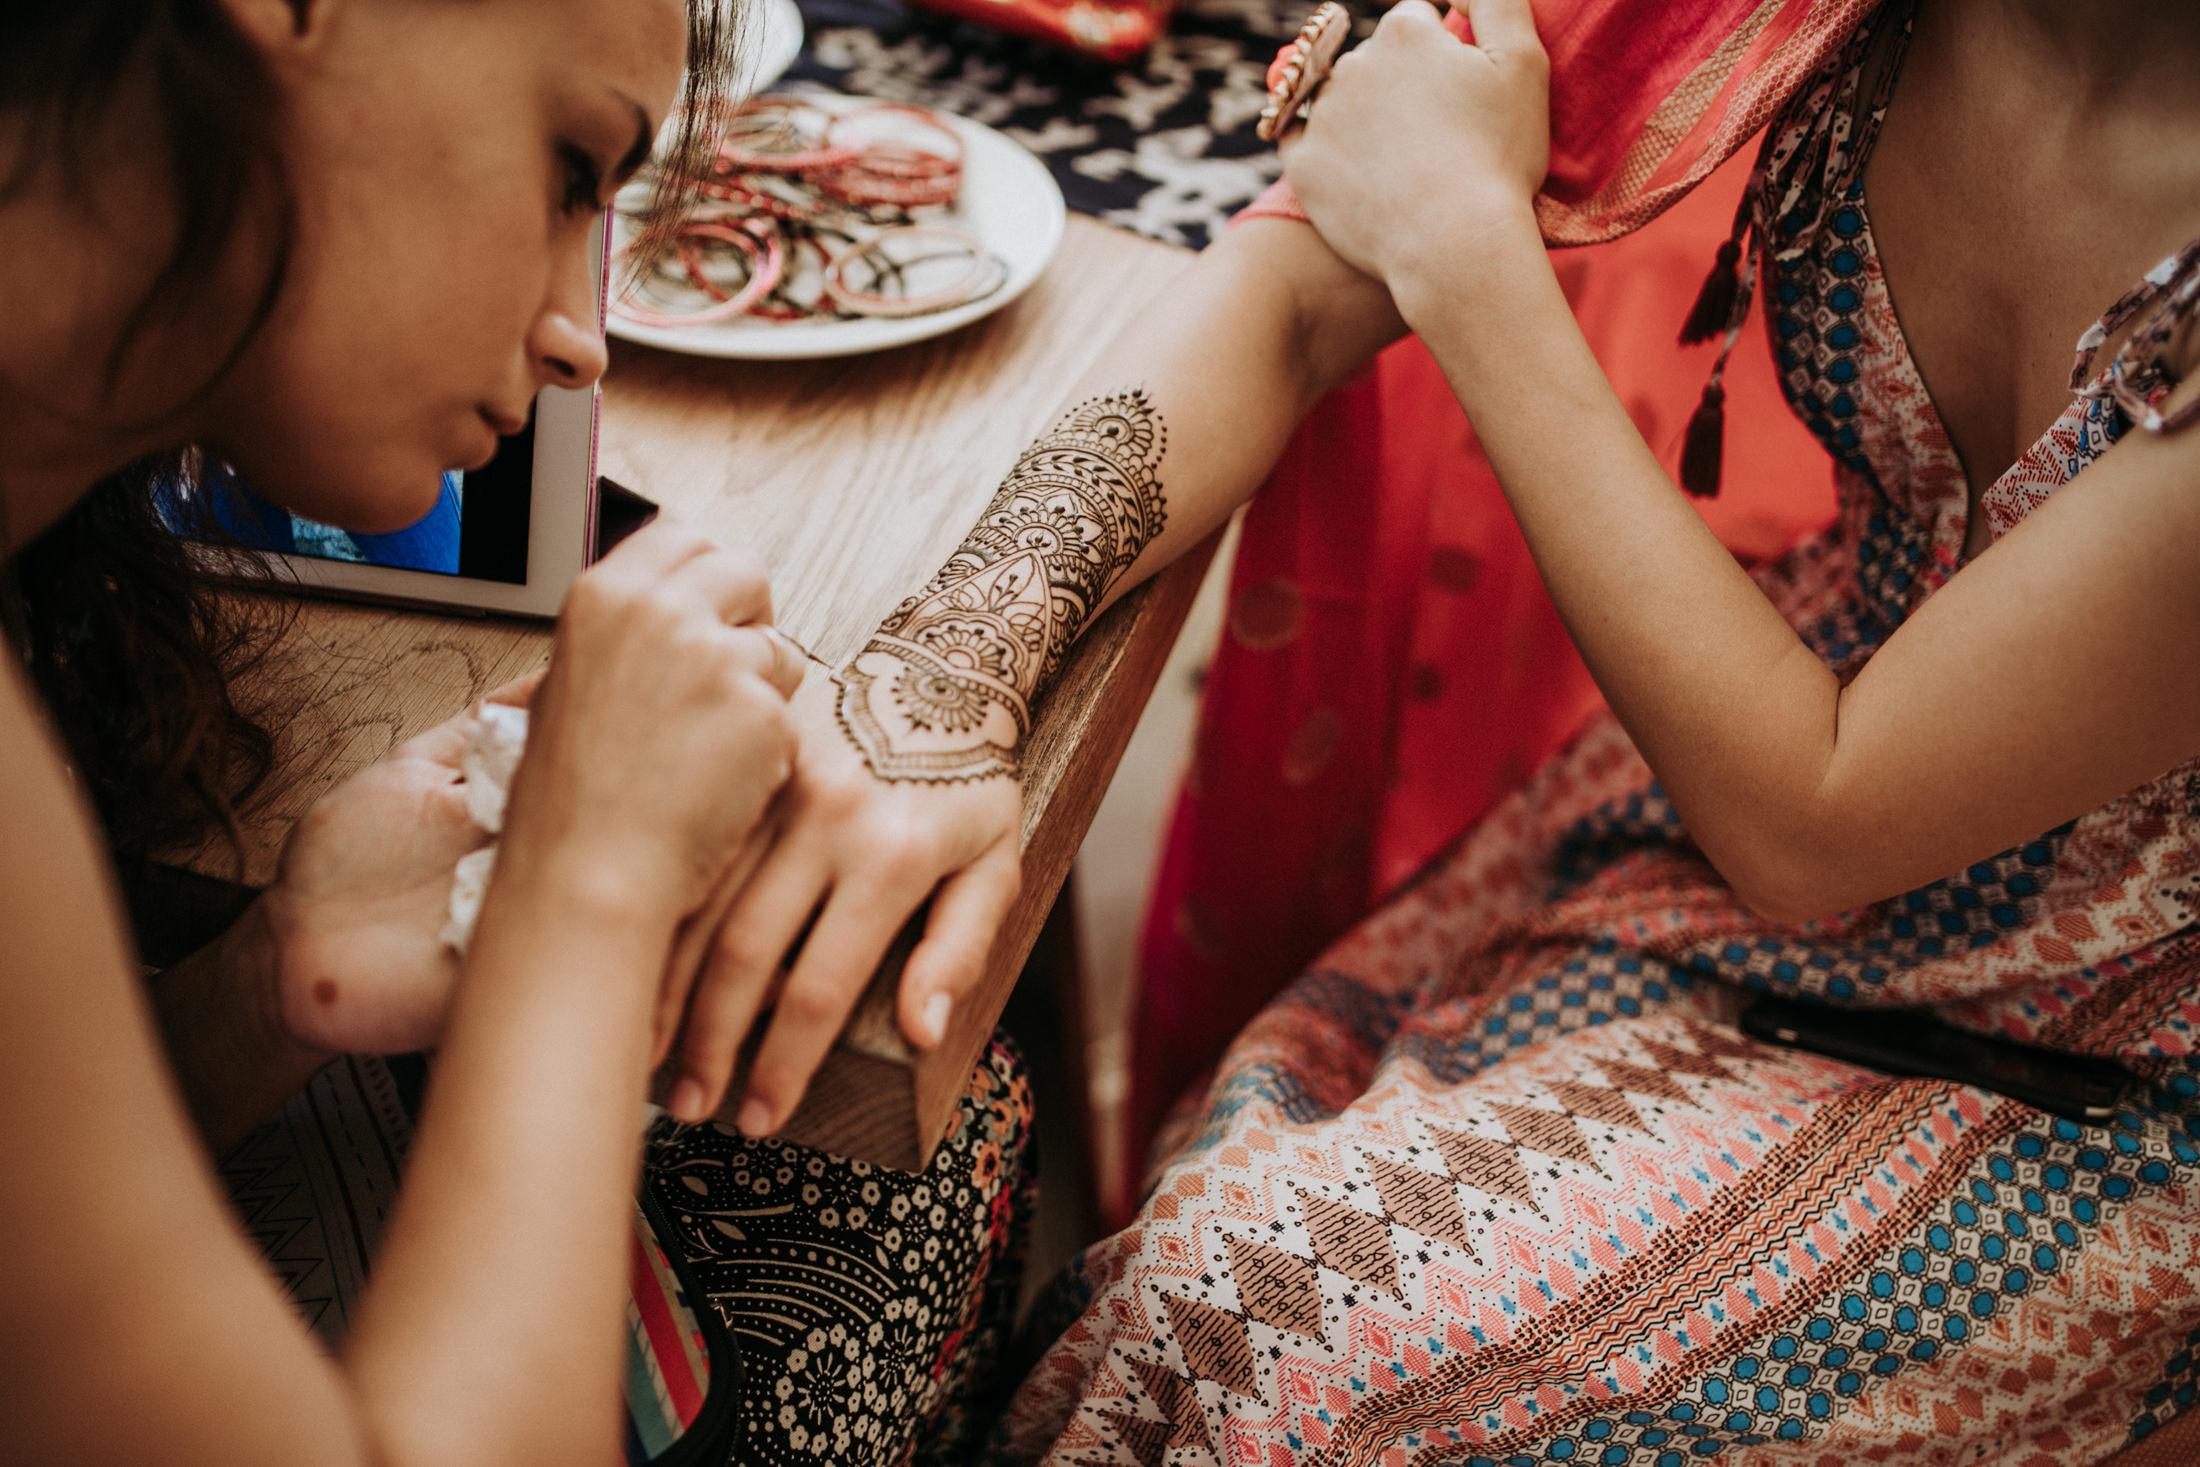 Wedding_Photographer_Mallorca_Daniela-Marquardt_Photography_New_York_Iceland_Tuscany_Santorini_Portugal_Austria_Bavaria_Elopement_Hochzeitsfotograf_AntjeRajat1_24